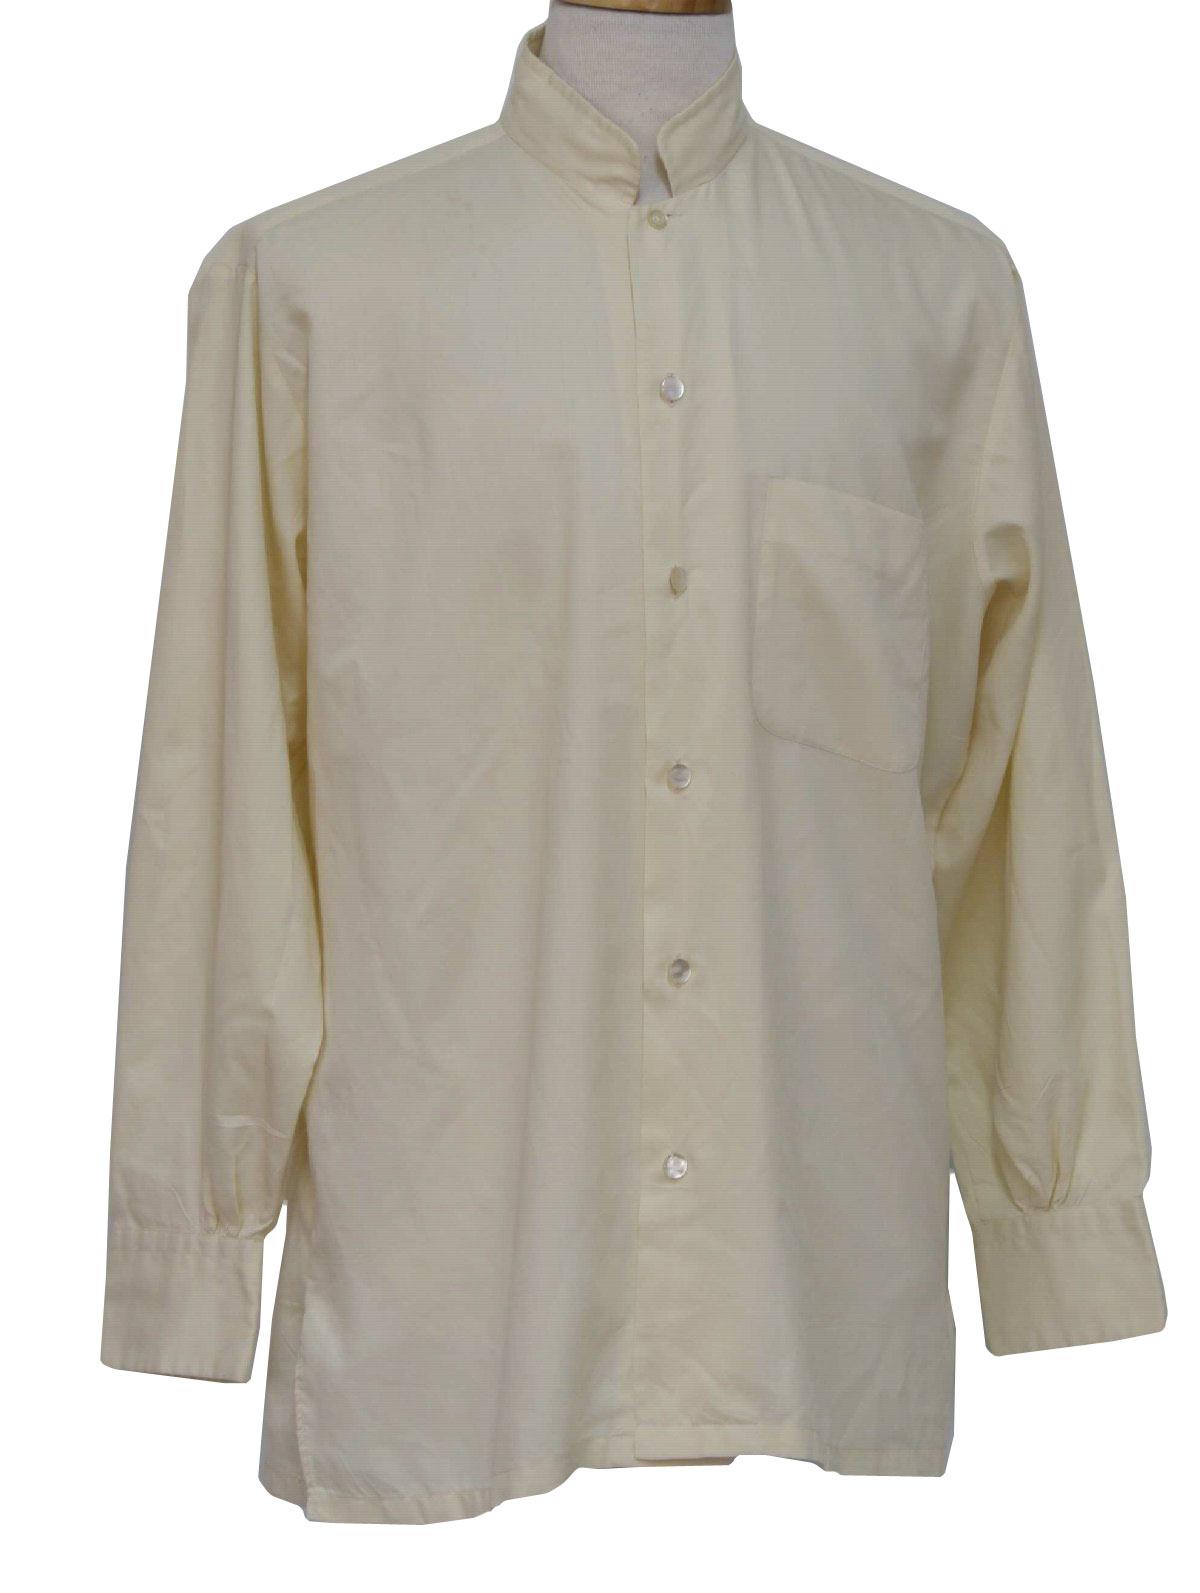 Kentfield Nehru 60s Vintage Shirt 60s Kentfield Nehru Mens